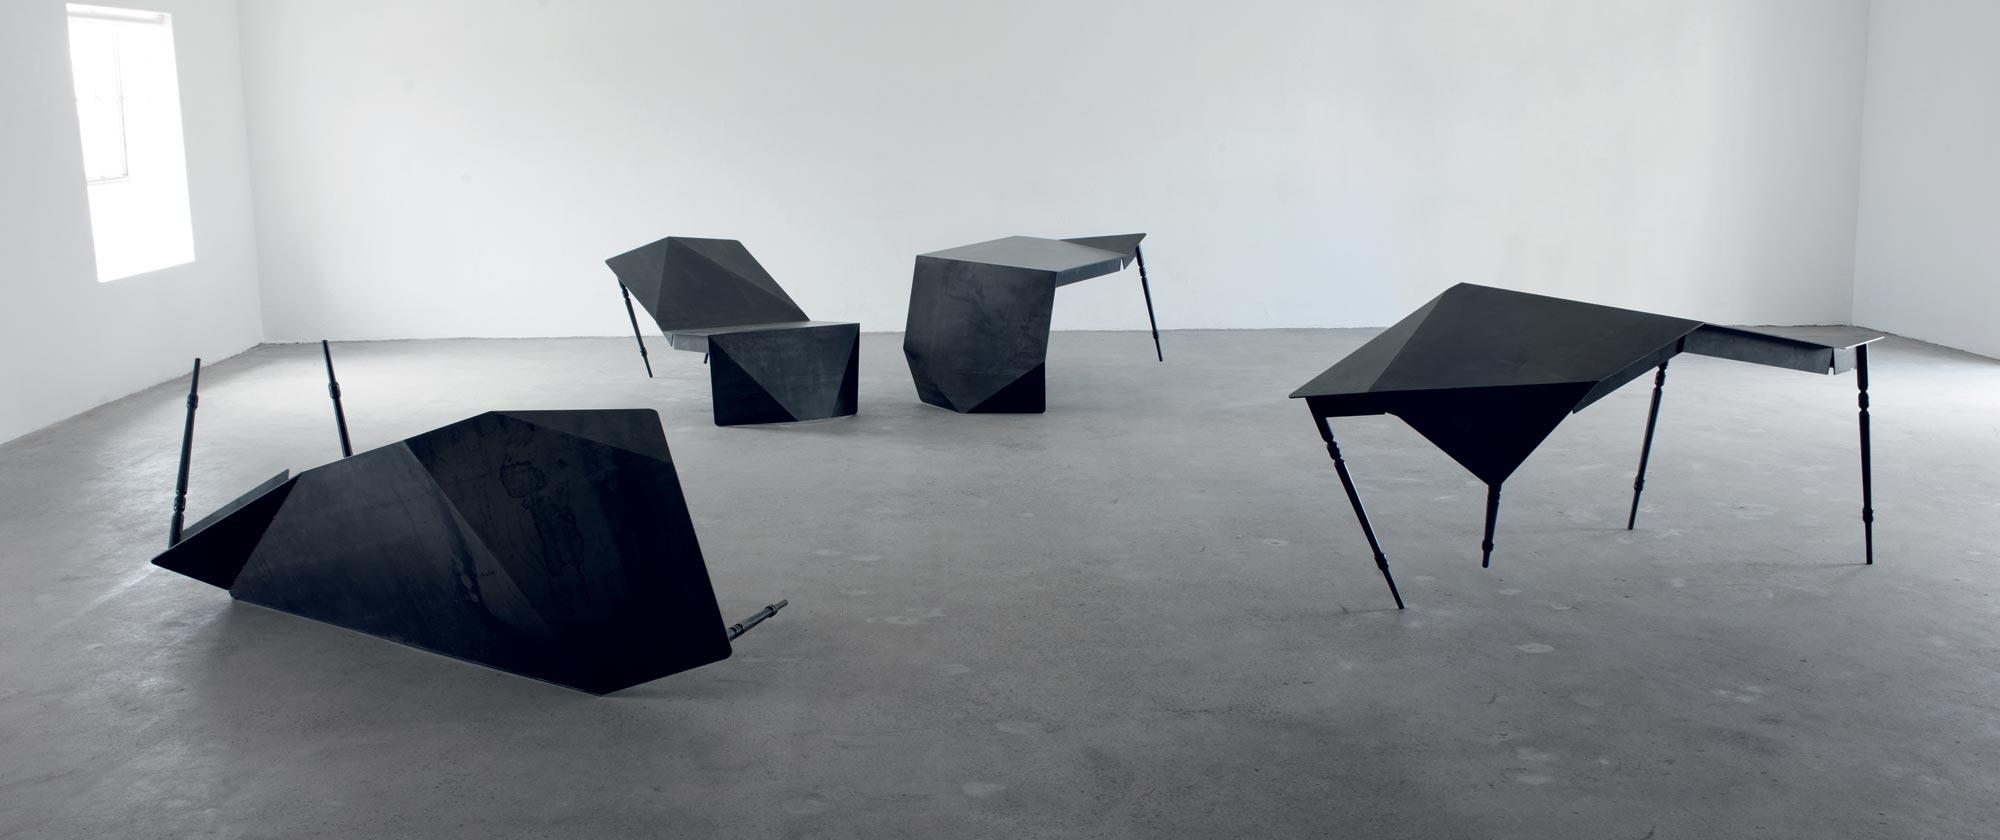 design miami Top 5 Galleries at Design Miami 2016 Gregor Jenkin 011